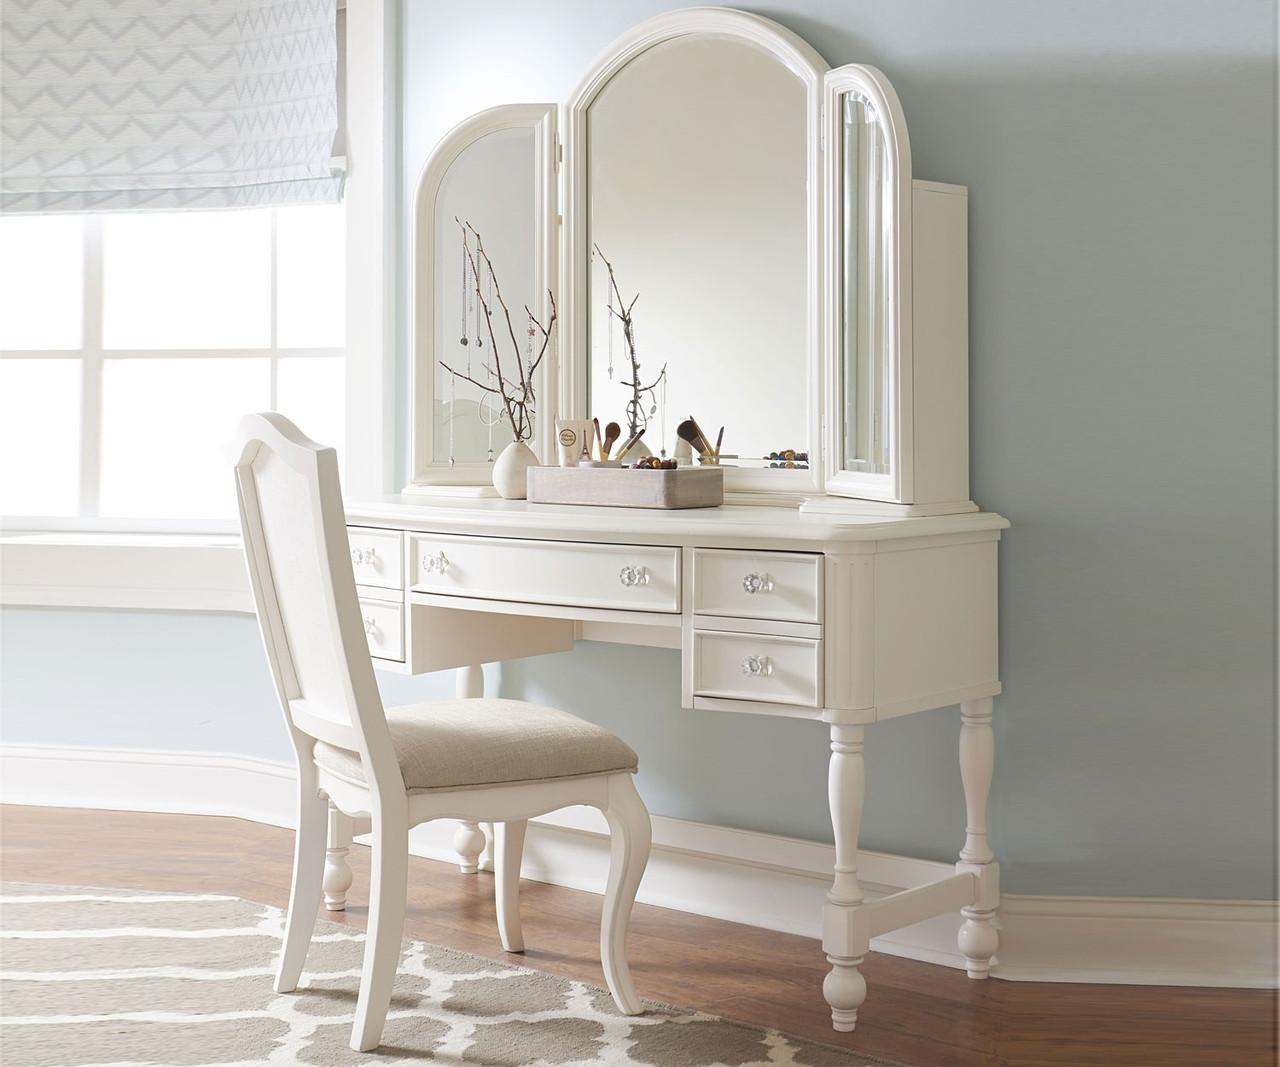 Harmony vanity desk 4910 6100 legacy classic kids kids bedroom furniture by wendy bellisimo Badcock home furniture more pompano beach fl